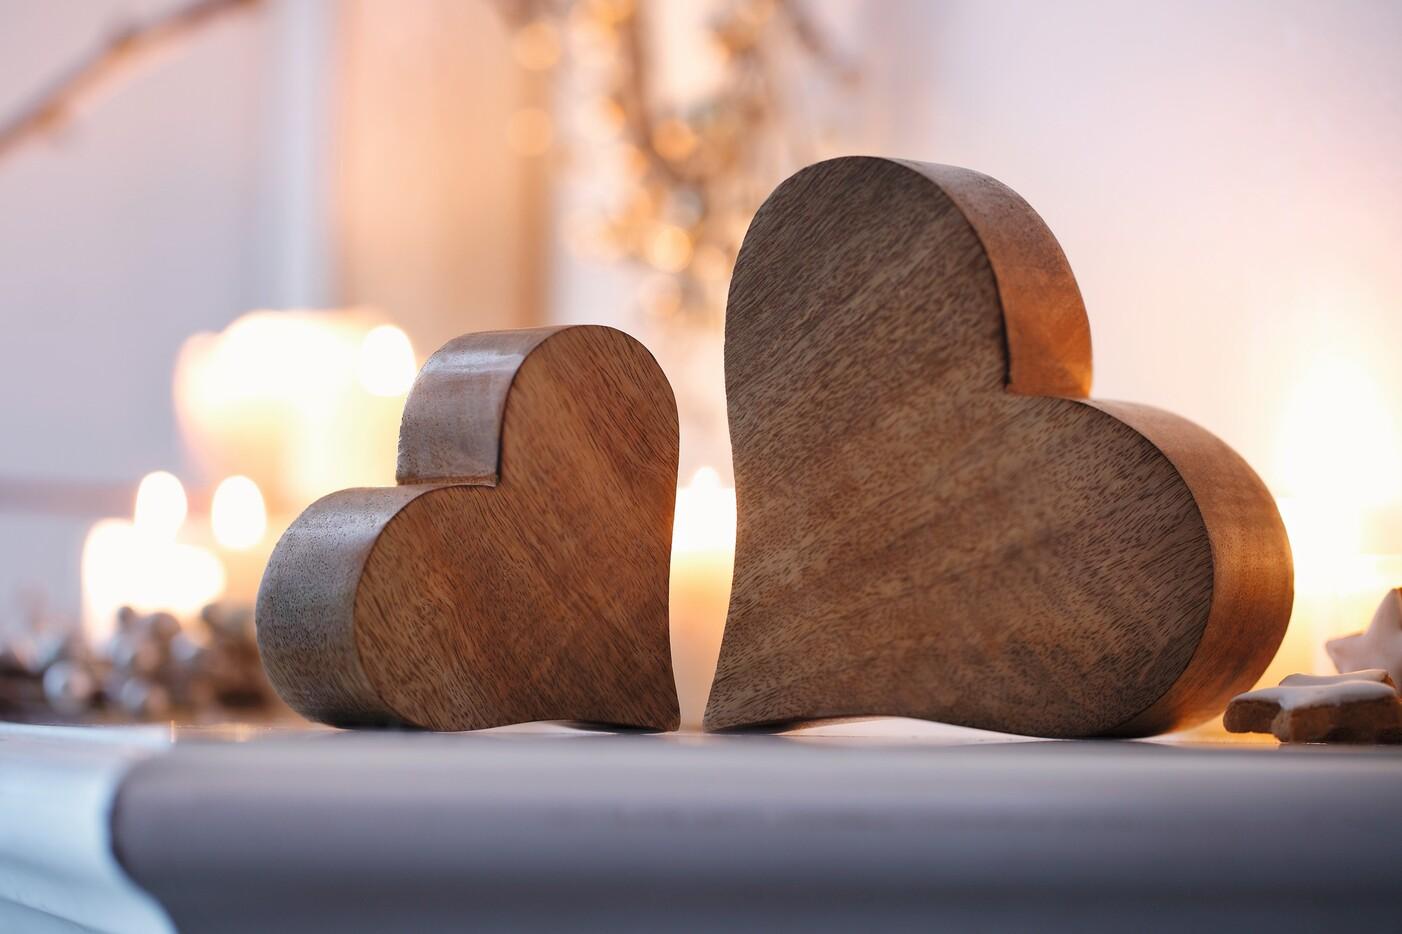 Zwei Herzen aus Holz